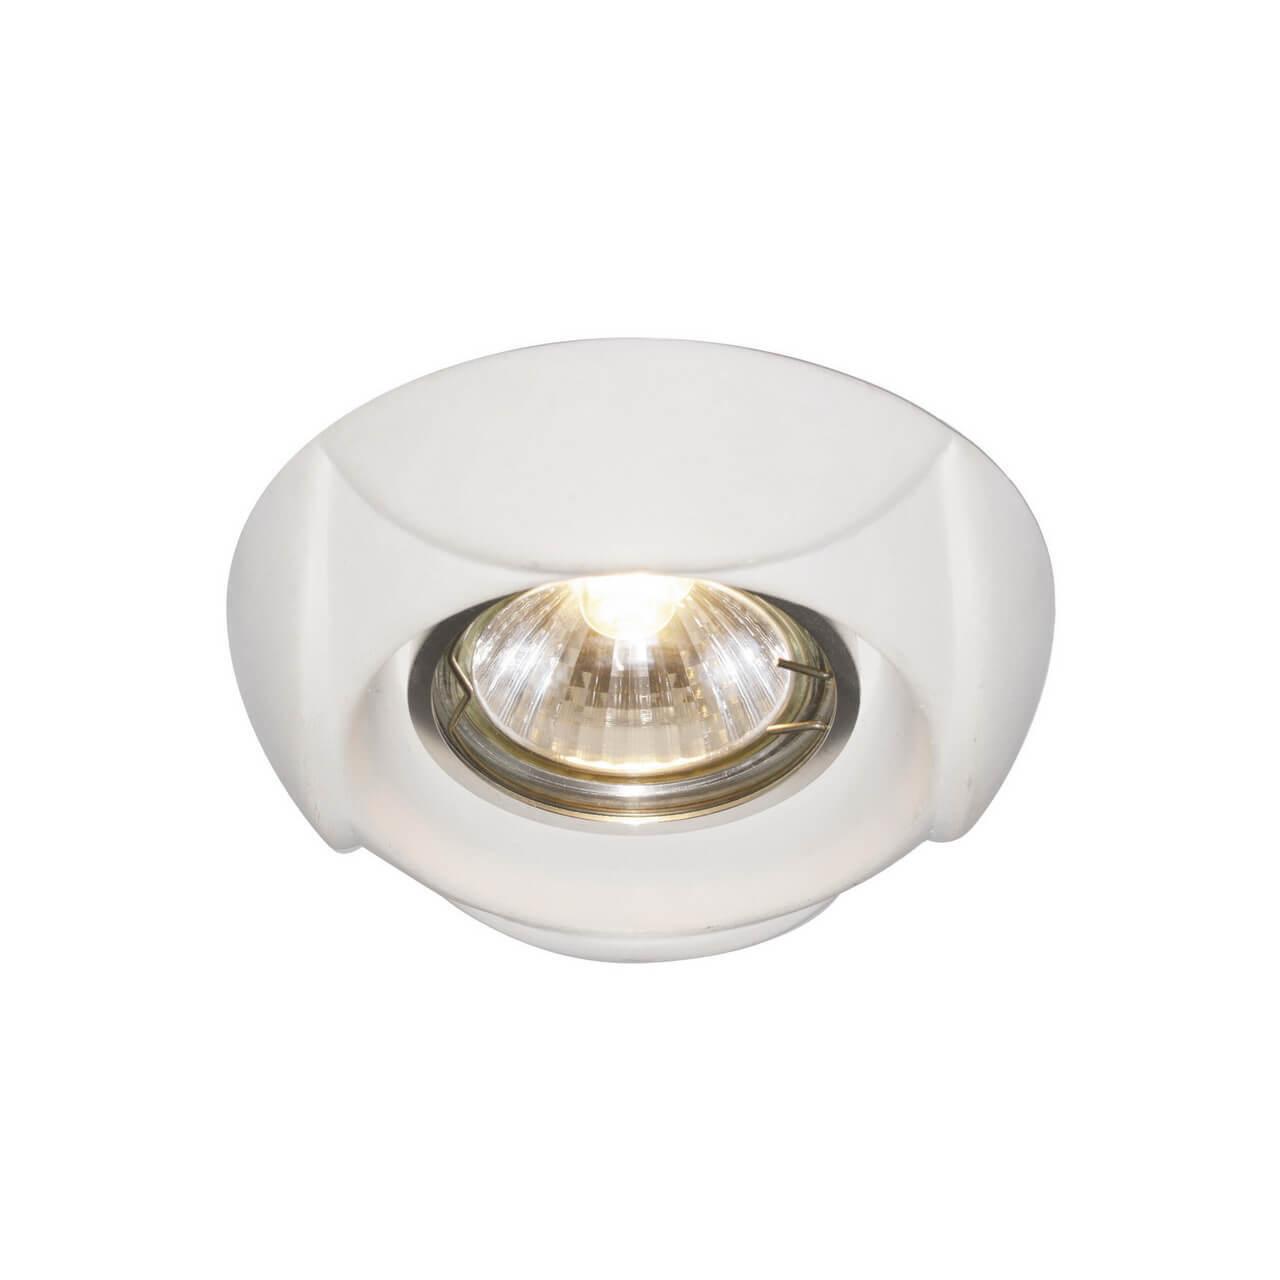 Встраиваемый светильник Arte Lamp Cratere A5241PL-1WH arte lamp светильник точечный arte lamp cratere a5073pl 1wh